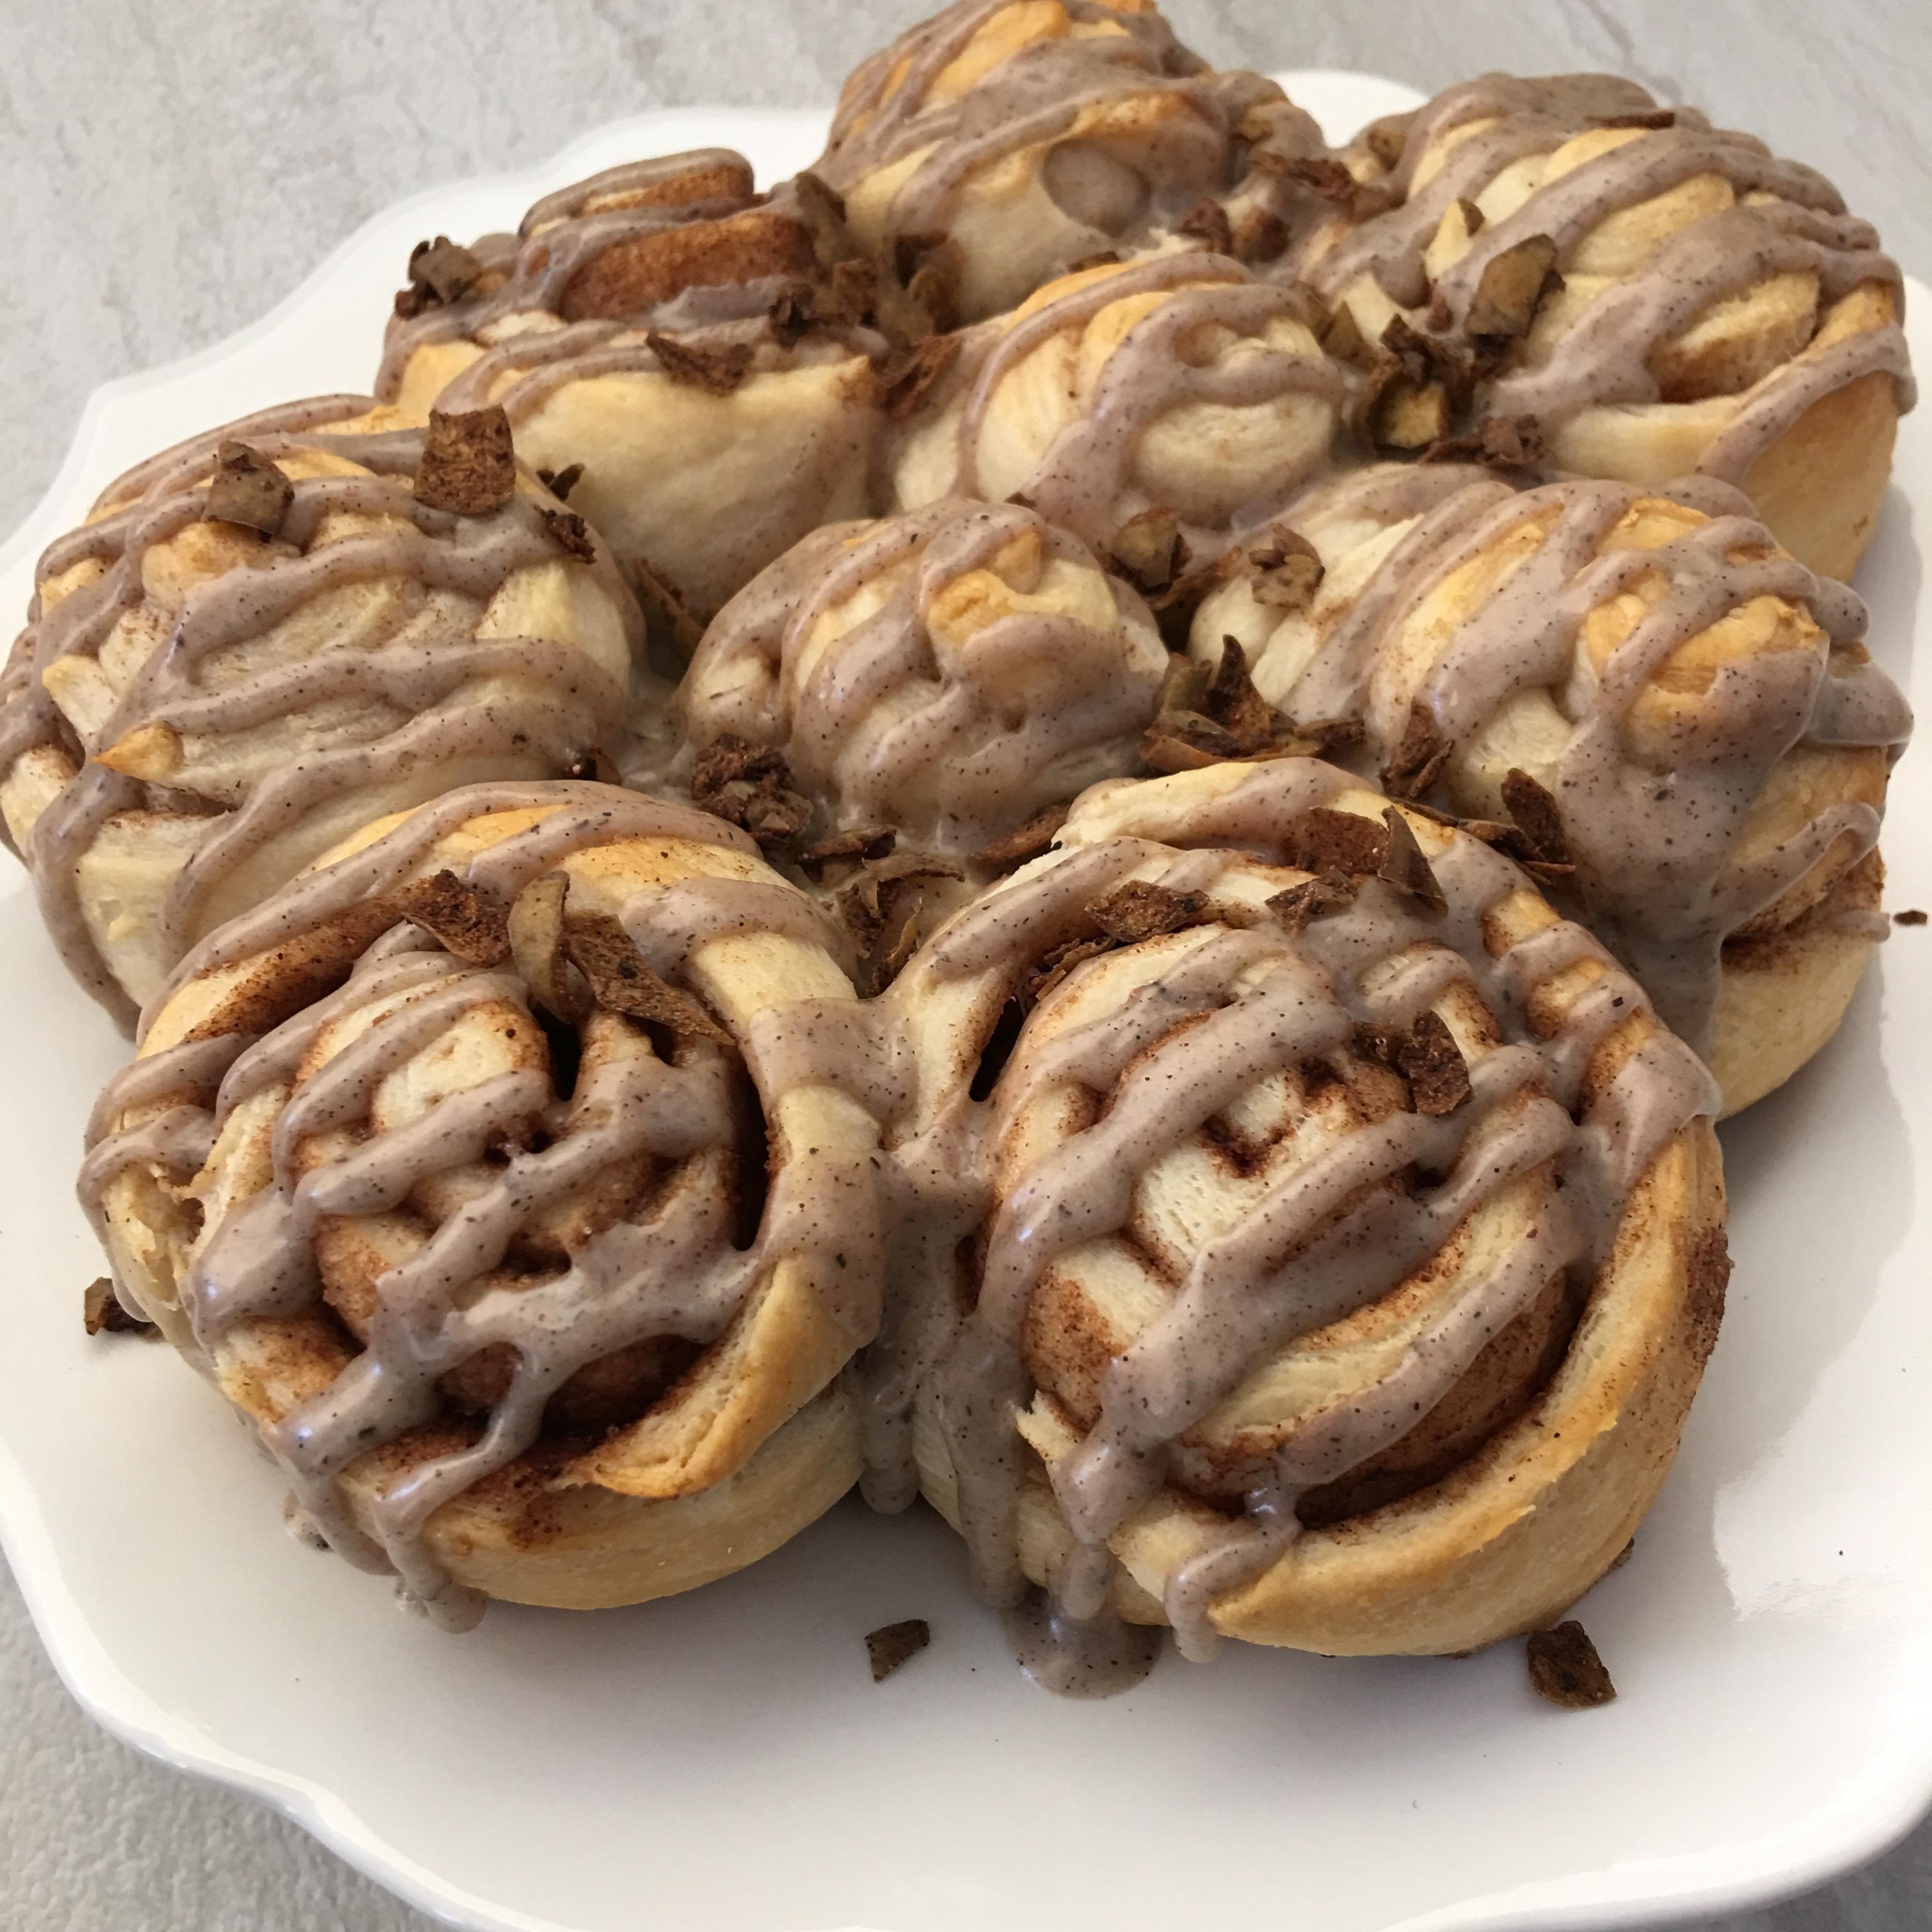 Free and Friendly Foods Organic Crescent Cinnamon & Chocolate Rolls